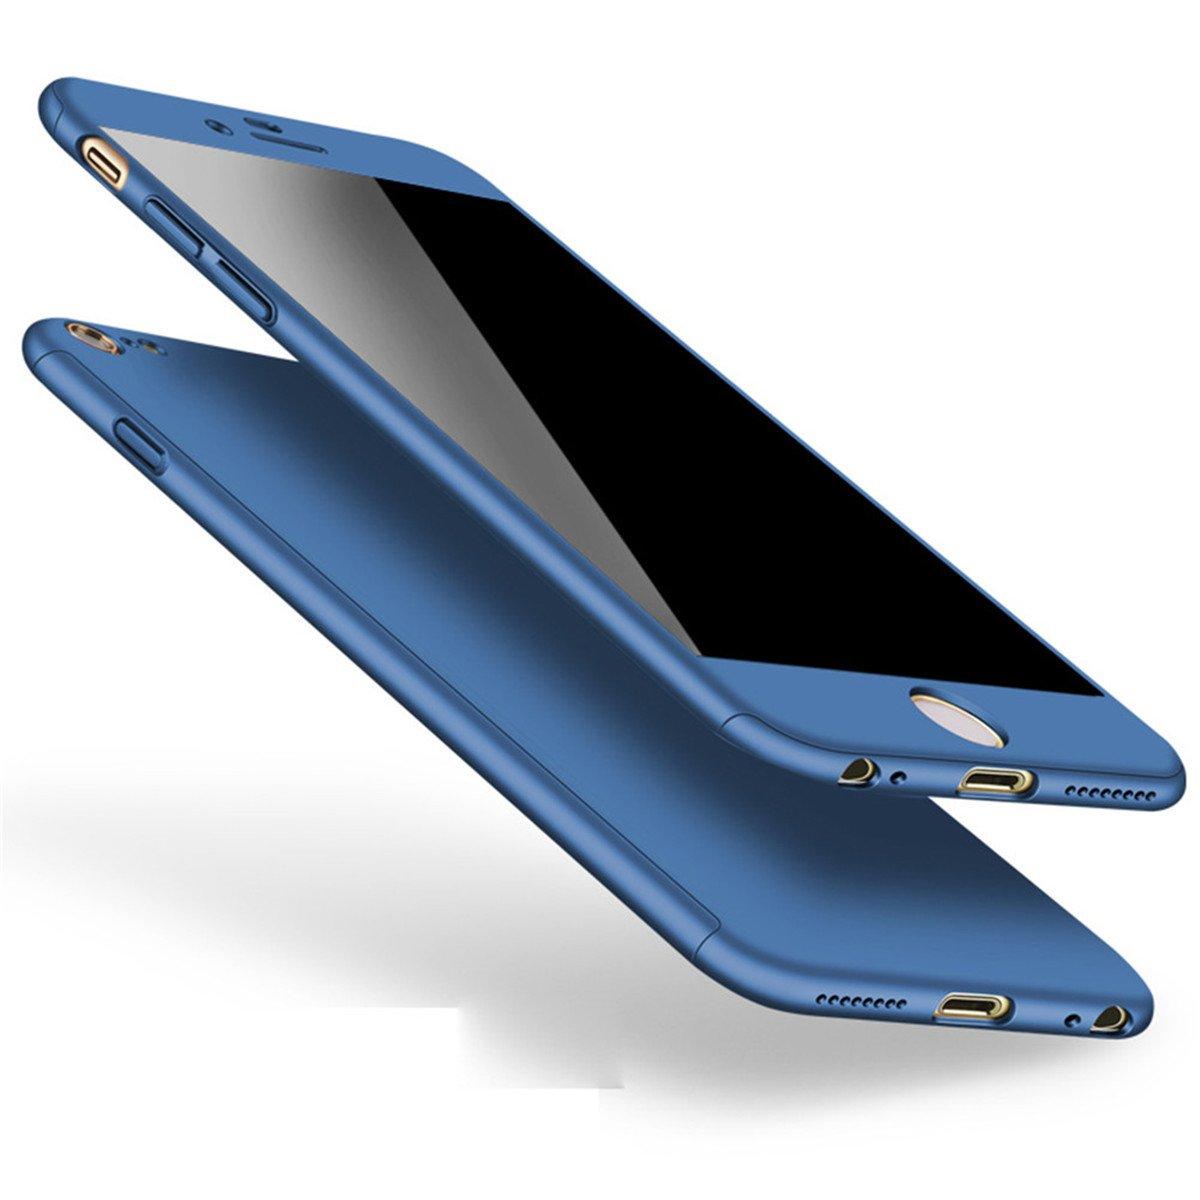 iPhone 6 Plus 6s Plus Hü lle 360 Grad Full Body Case Shockproof Protective Cover + Tempered Glas Schutzfolie Handyhü lle Backcover Hartschale Schutzhü lle Rü ckseite fü r iPhone 6/6S Plus Etui Schale (Gold) Adamark